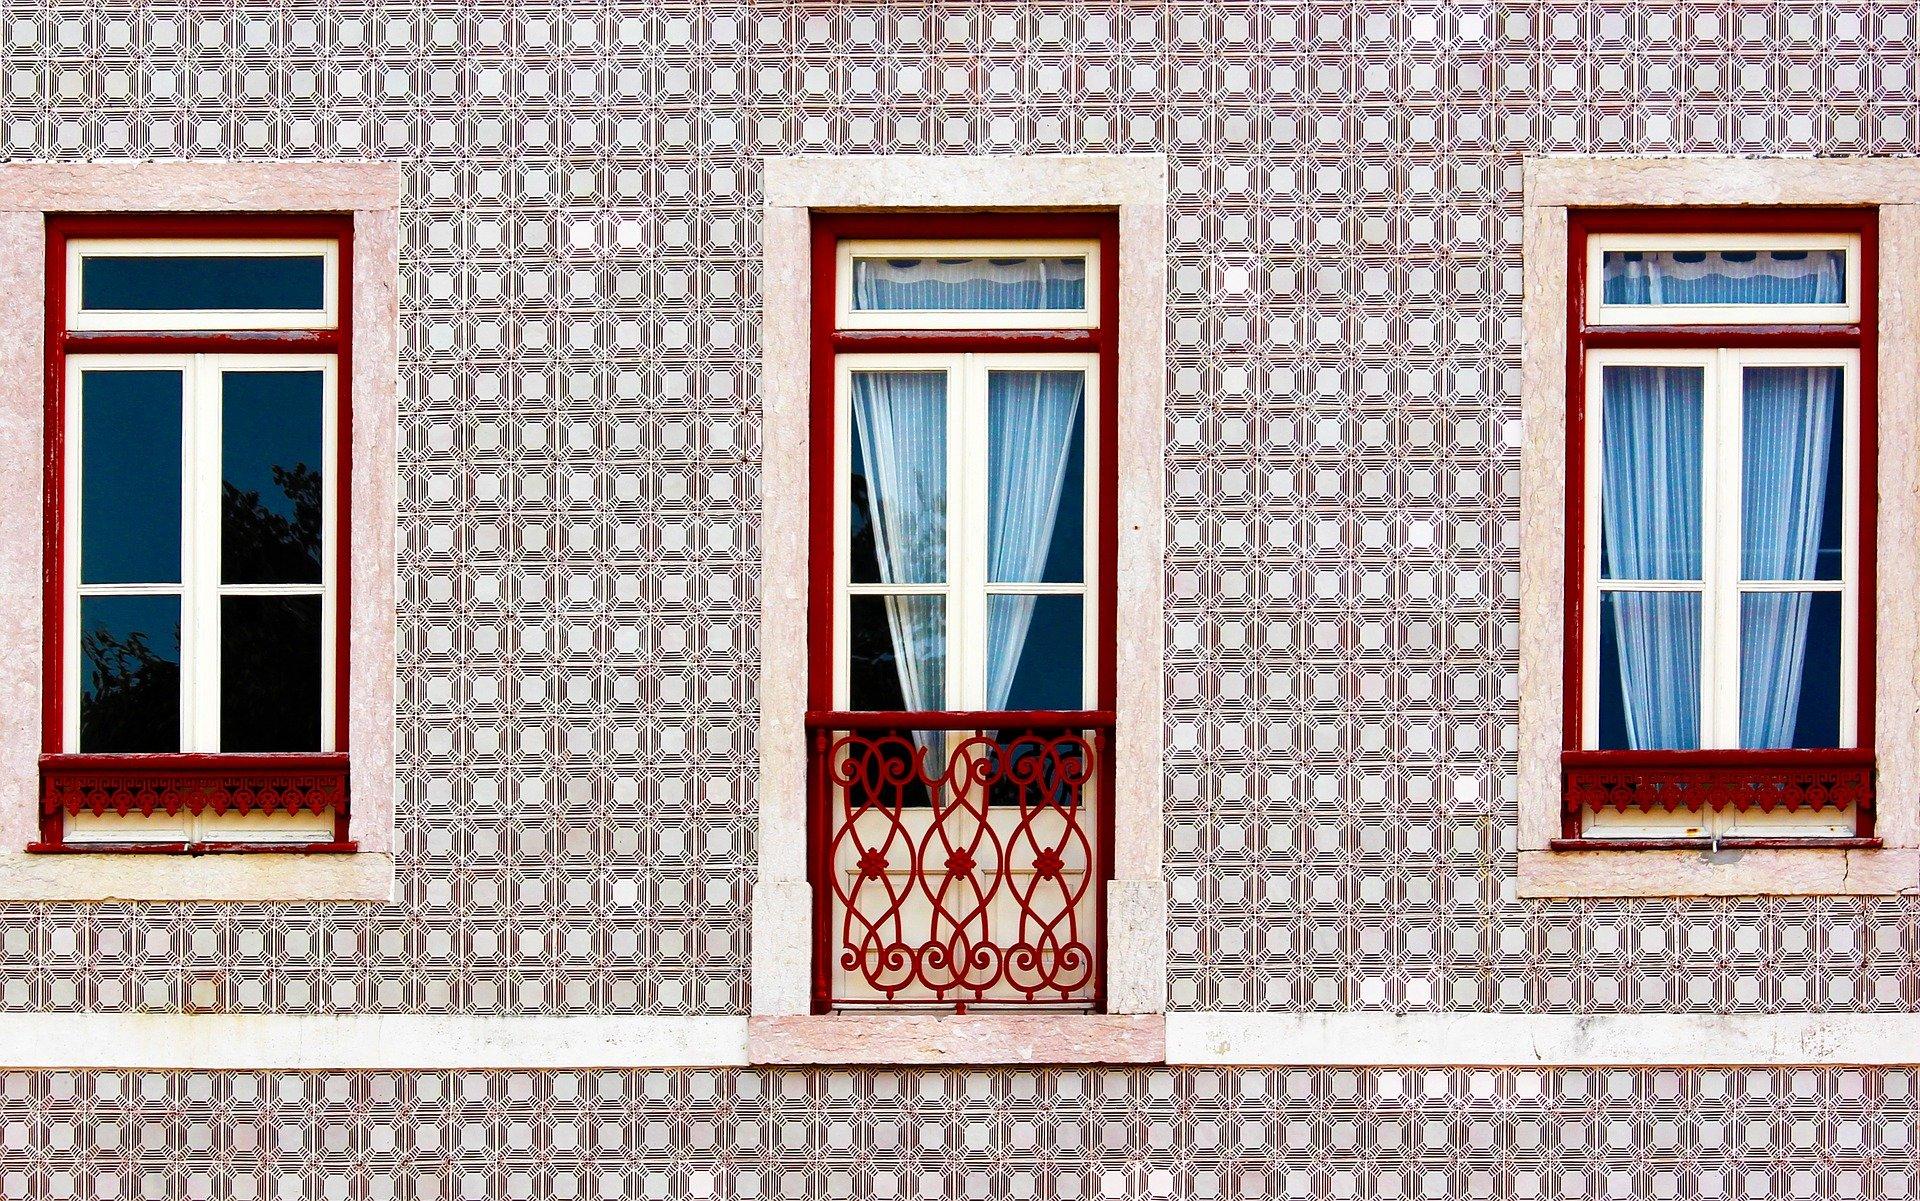 Renda Acessível em Lisboa